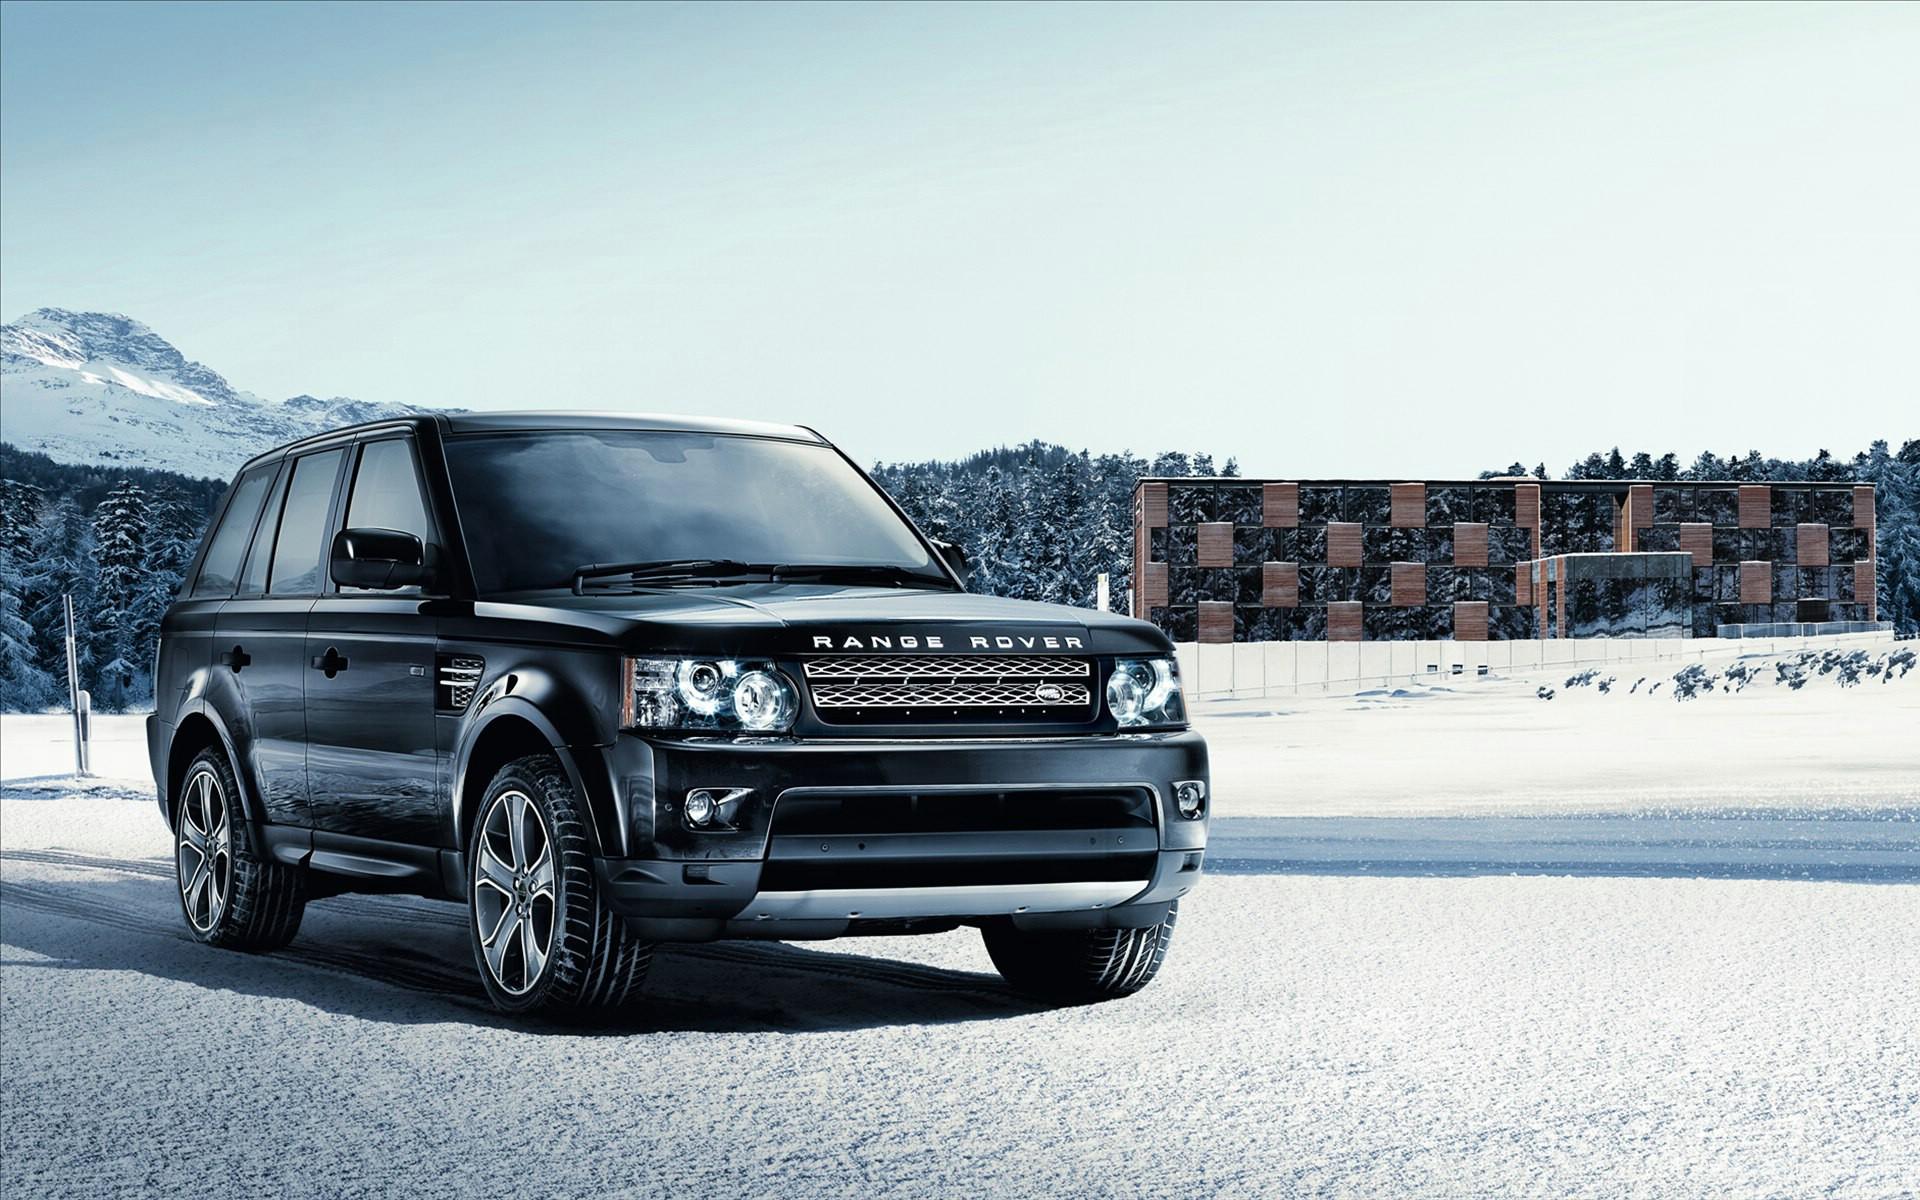 Range Rover Wallpaper Hd: Range Rover Sport 2012 Wallpaper